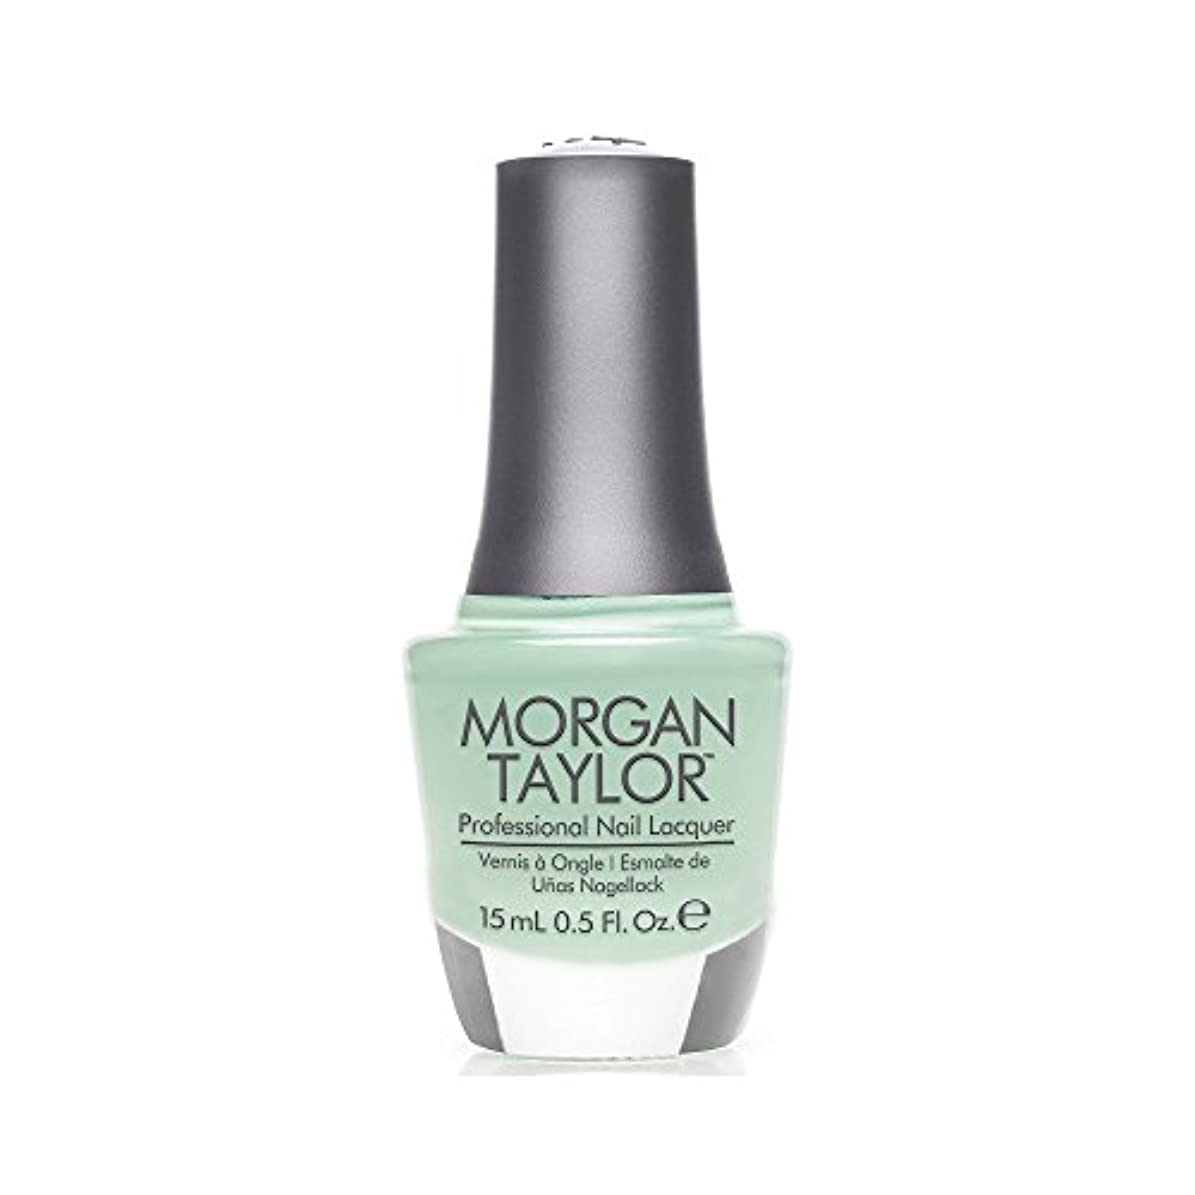 Morgan Taylor - Professional Nail Lacquer - Mint Chocolate Chip - 15 mL / 0.5oz